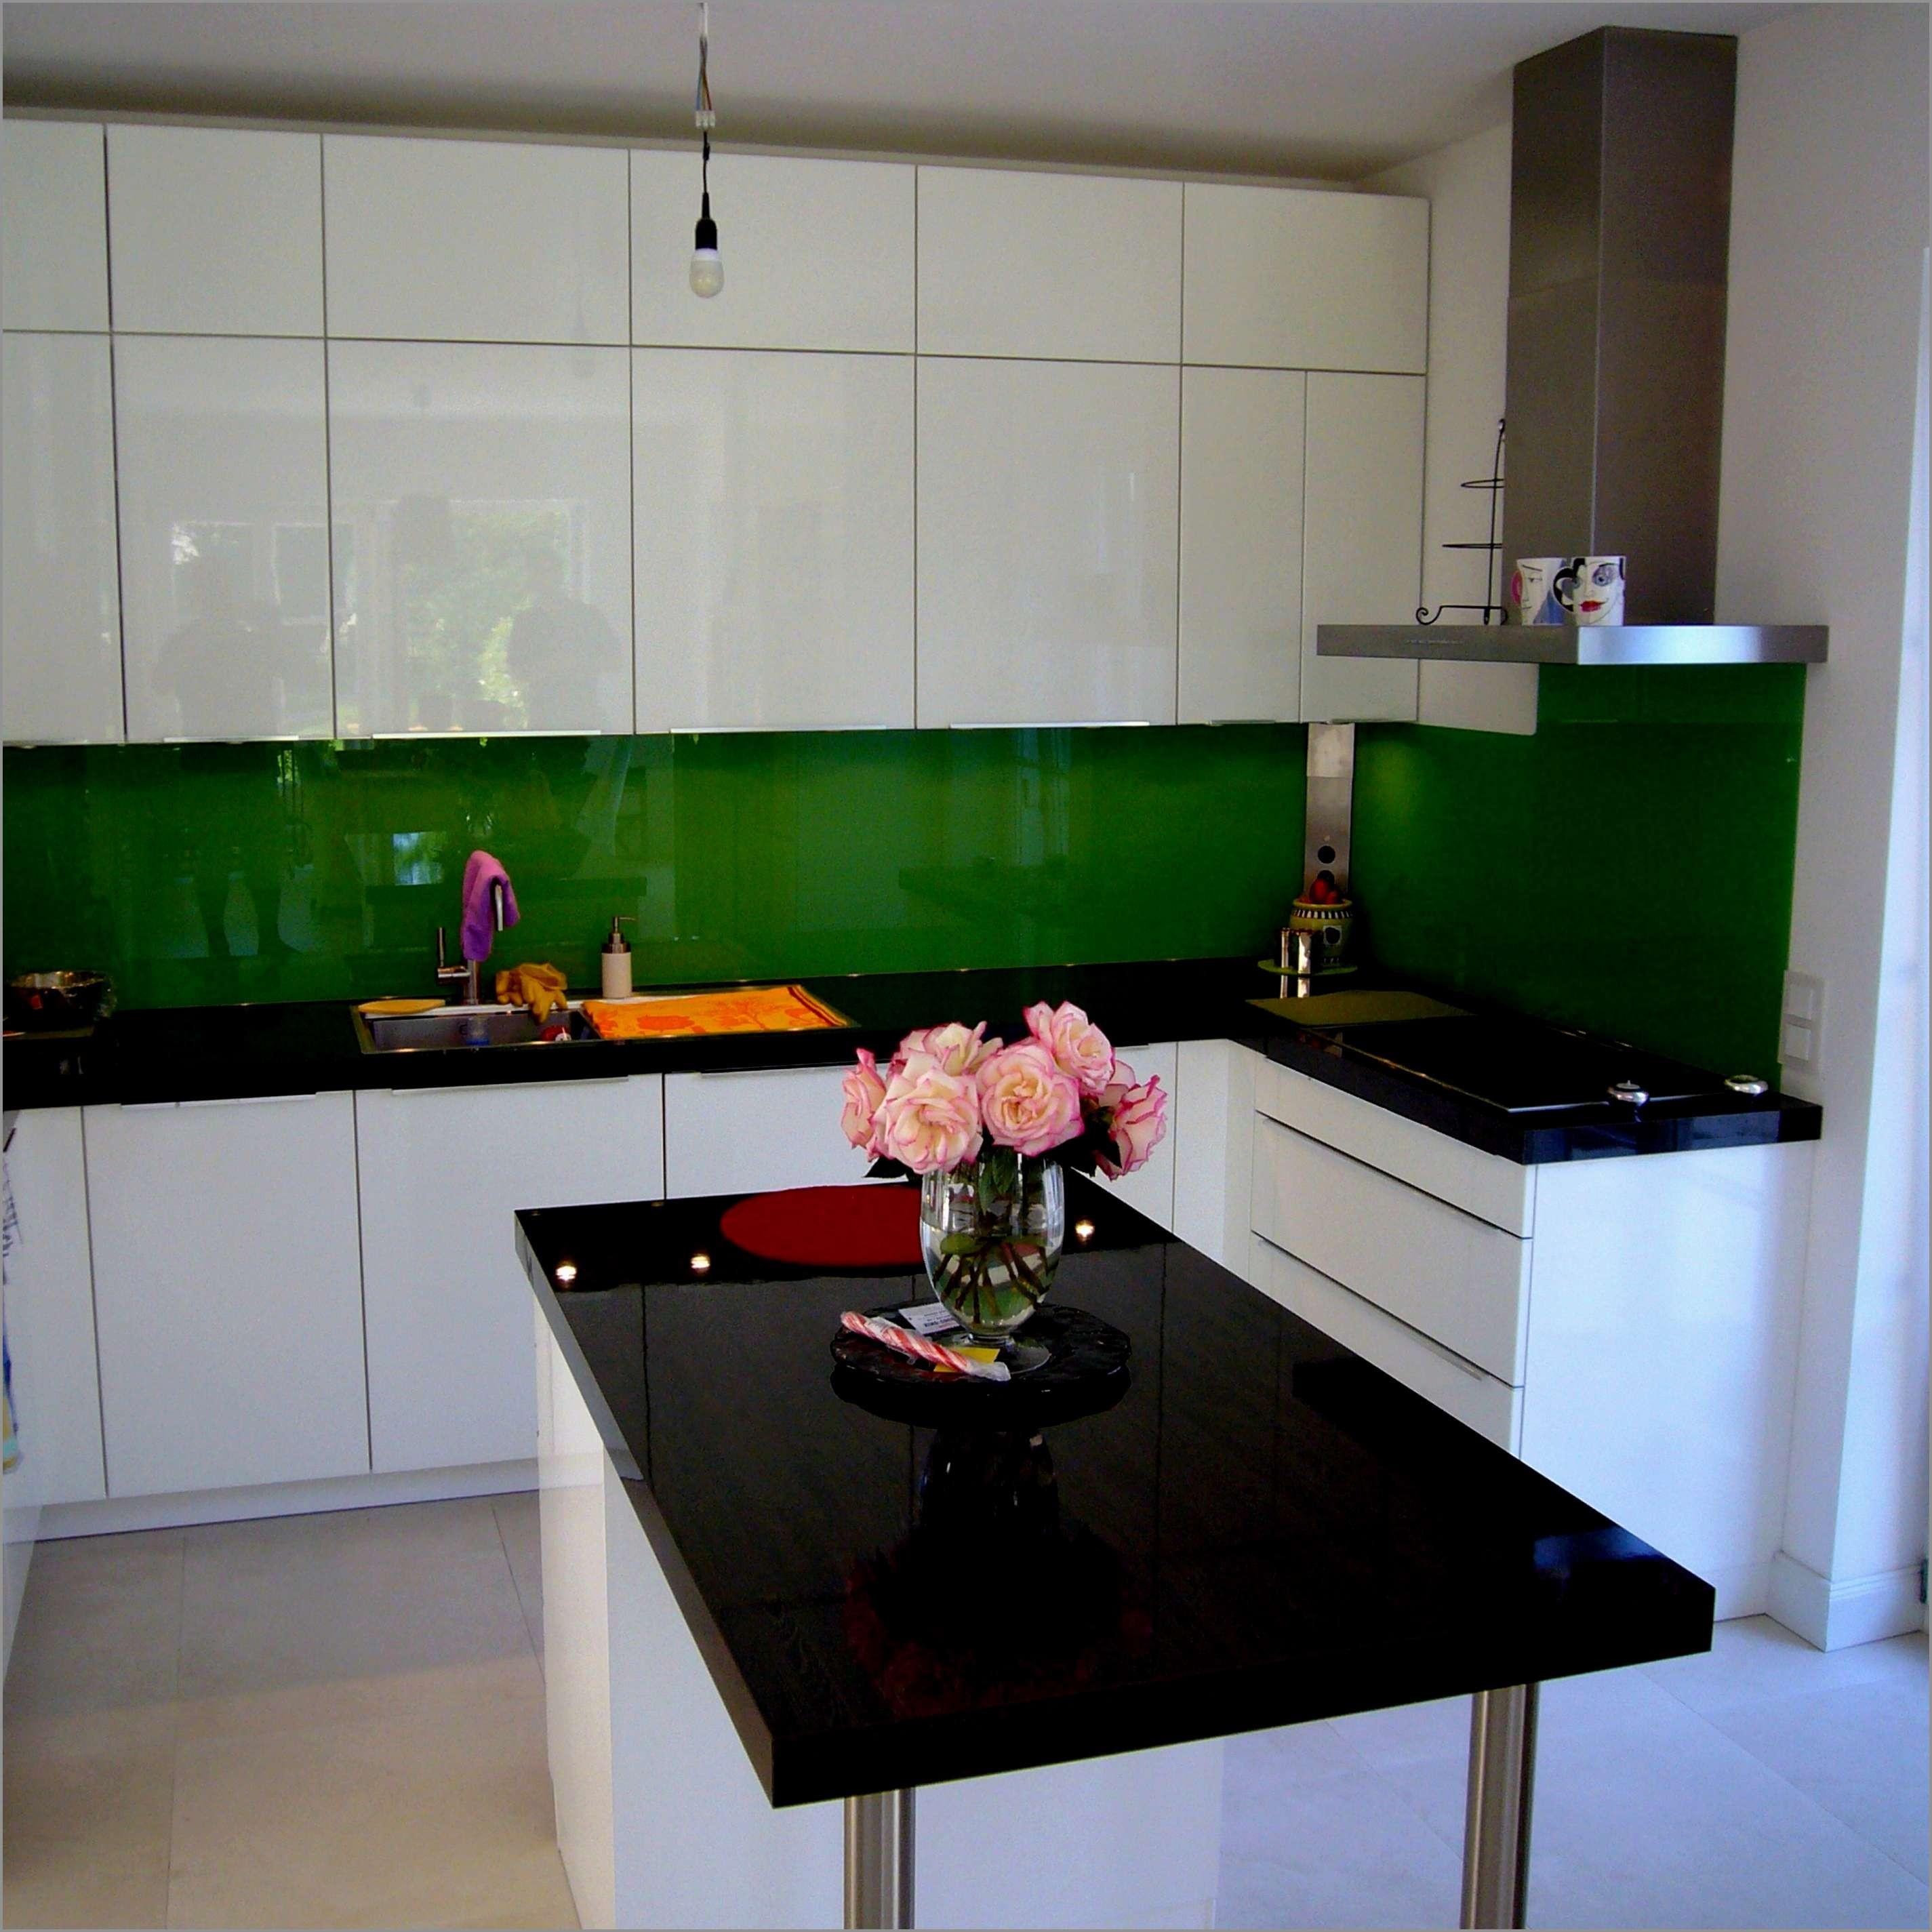 Spritzschutz Küche  Genial Spritzschutz Küche Ikea